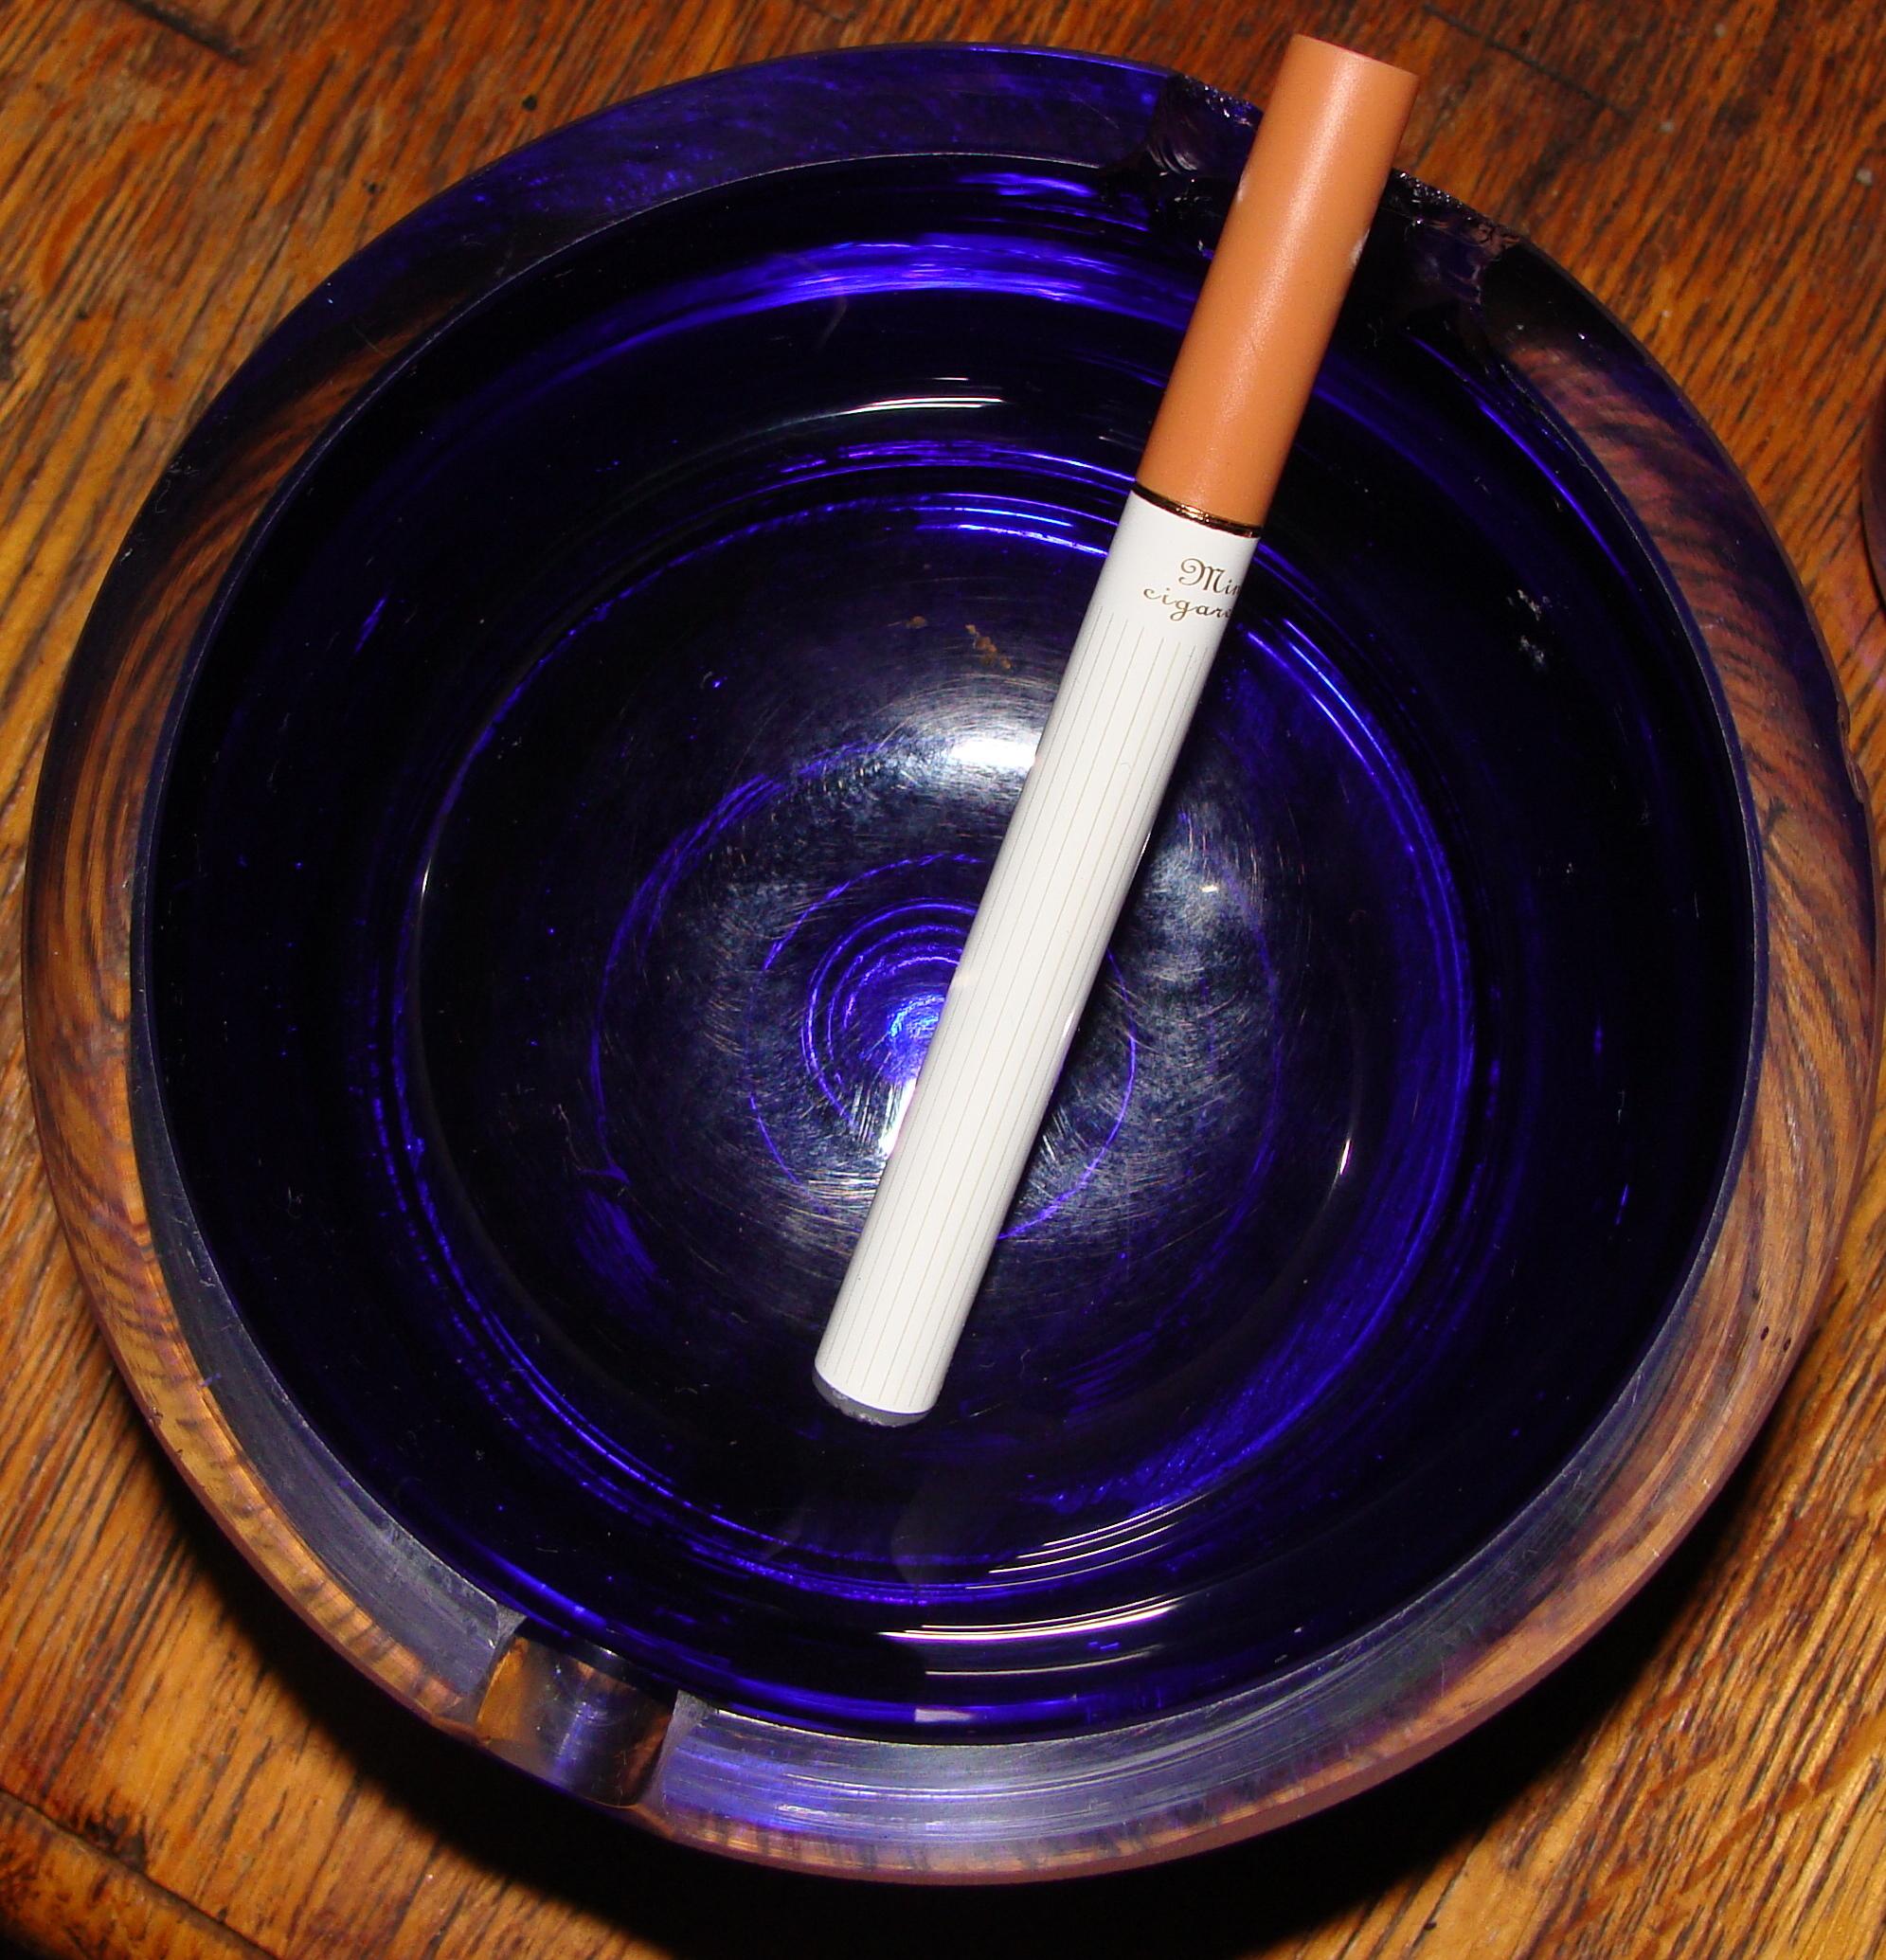 I love, love, love nicotine.